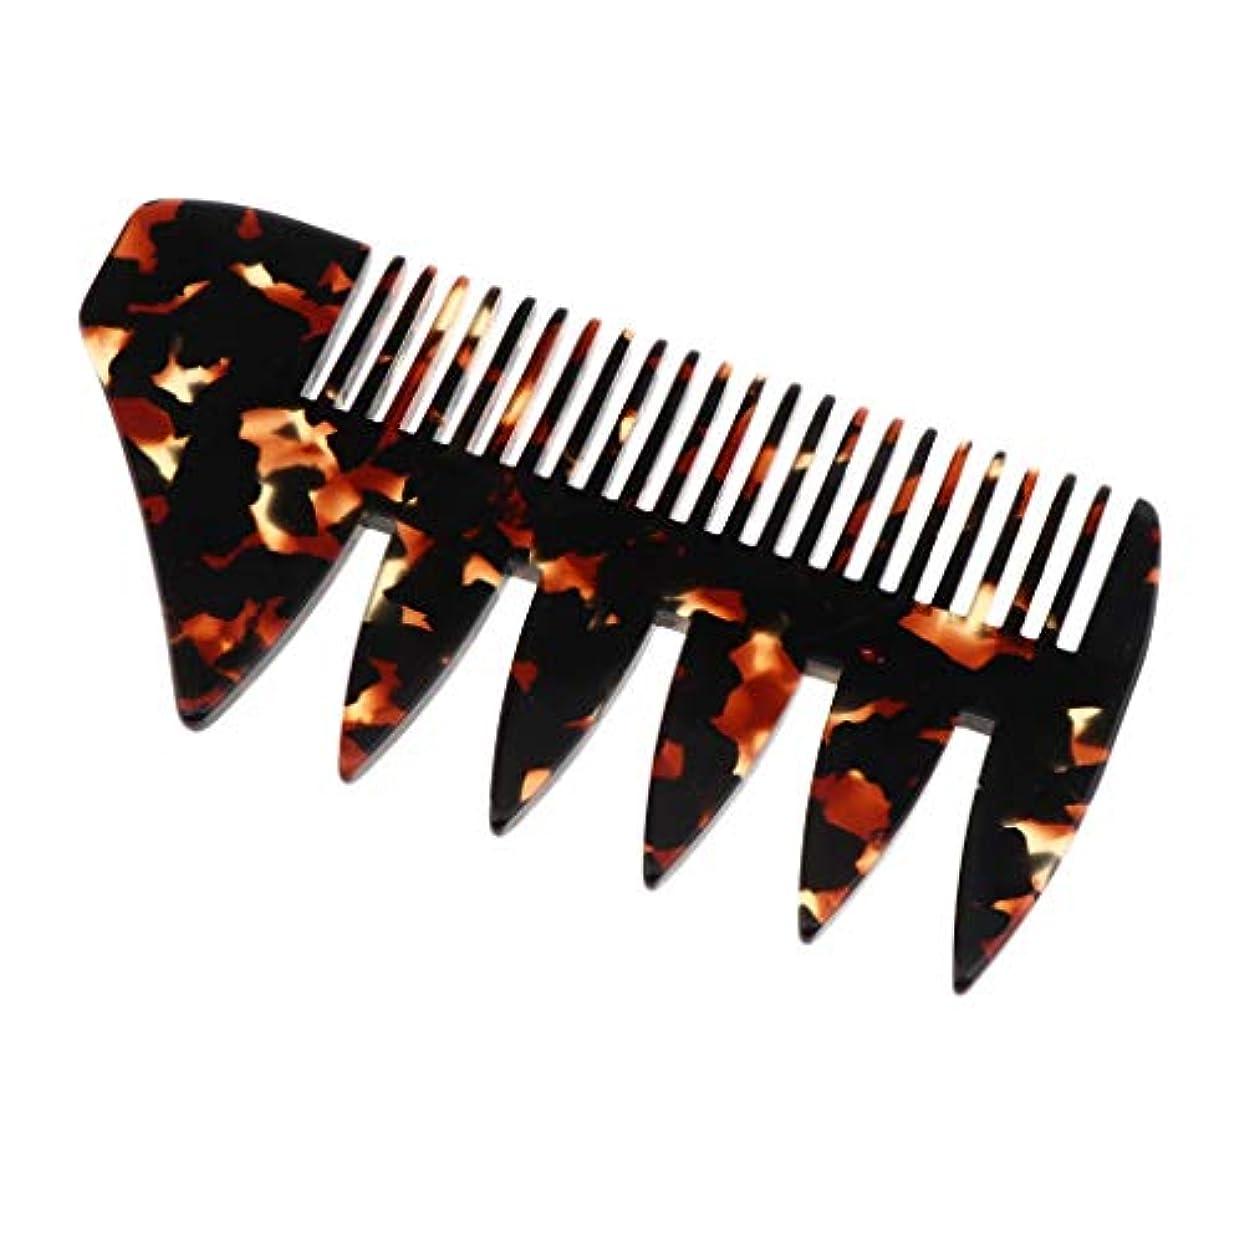 T TOOYFUL 全4色選択 ヘアコーム ヘアブラシ 頭皮マッサージ 広い歯 木製櫛 帯電防止 - 黒